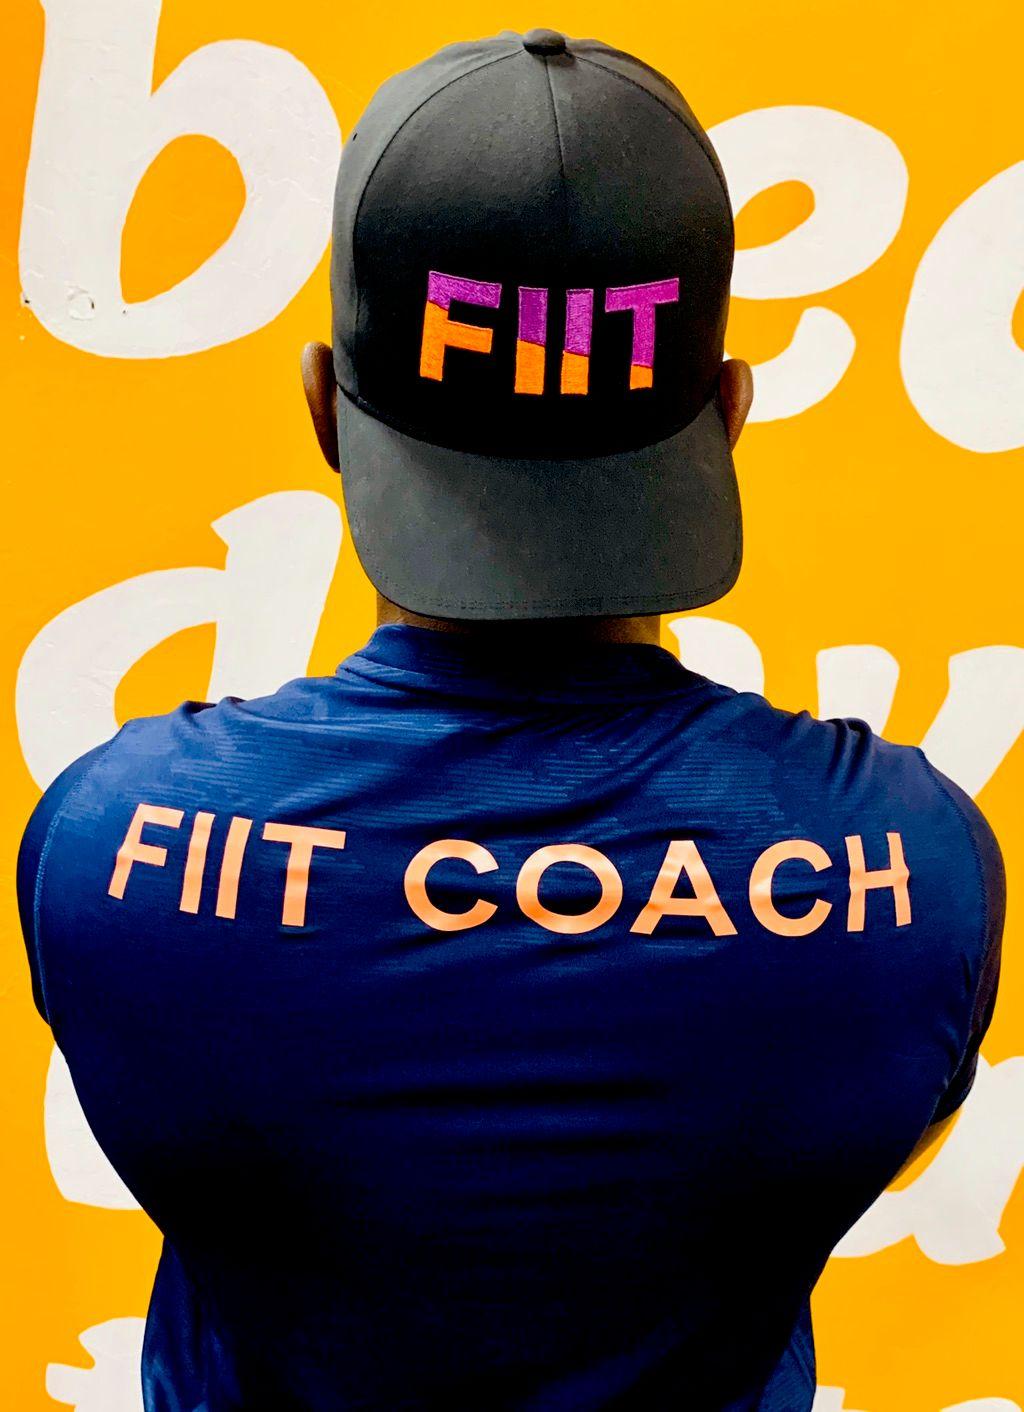 FIIT Coach